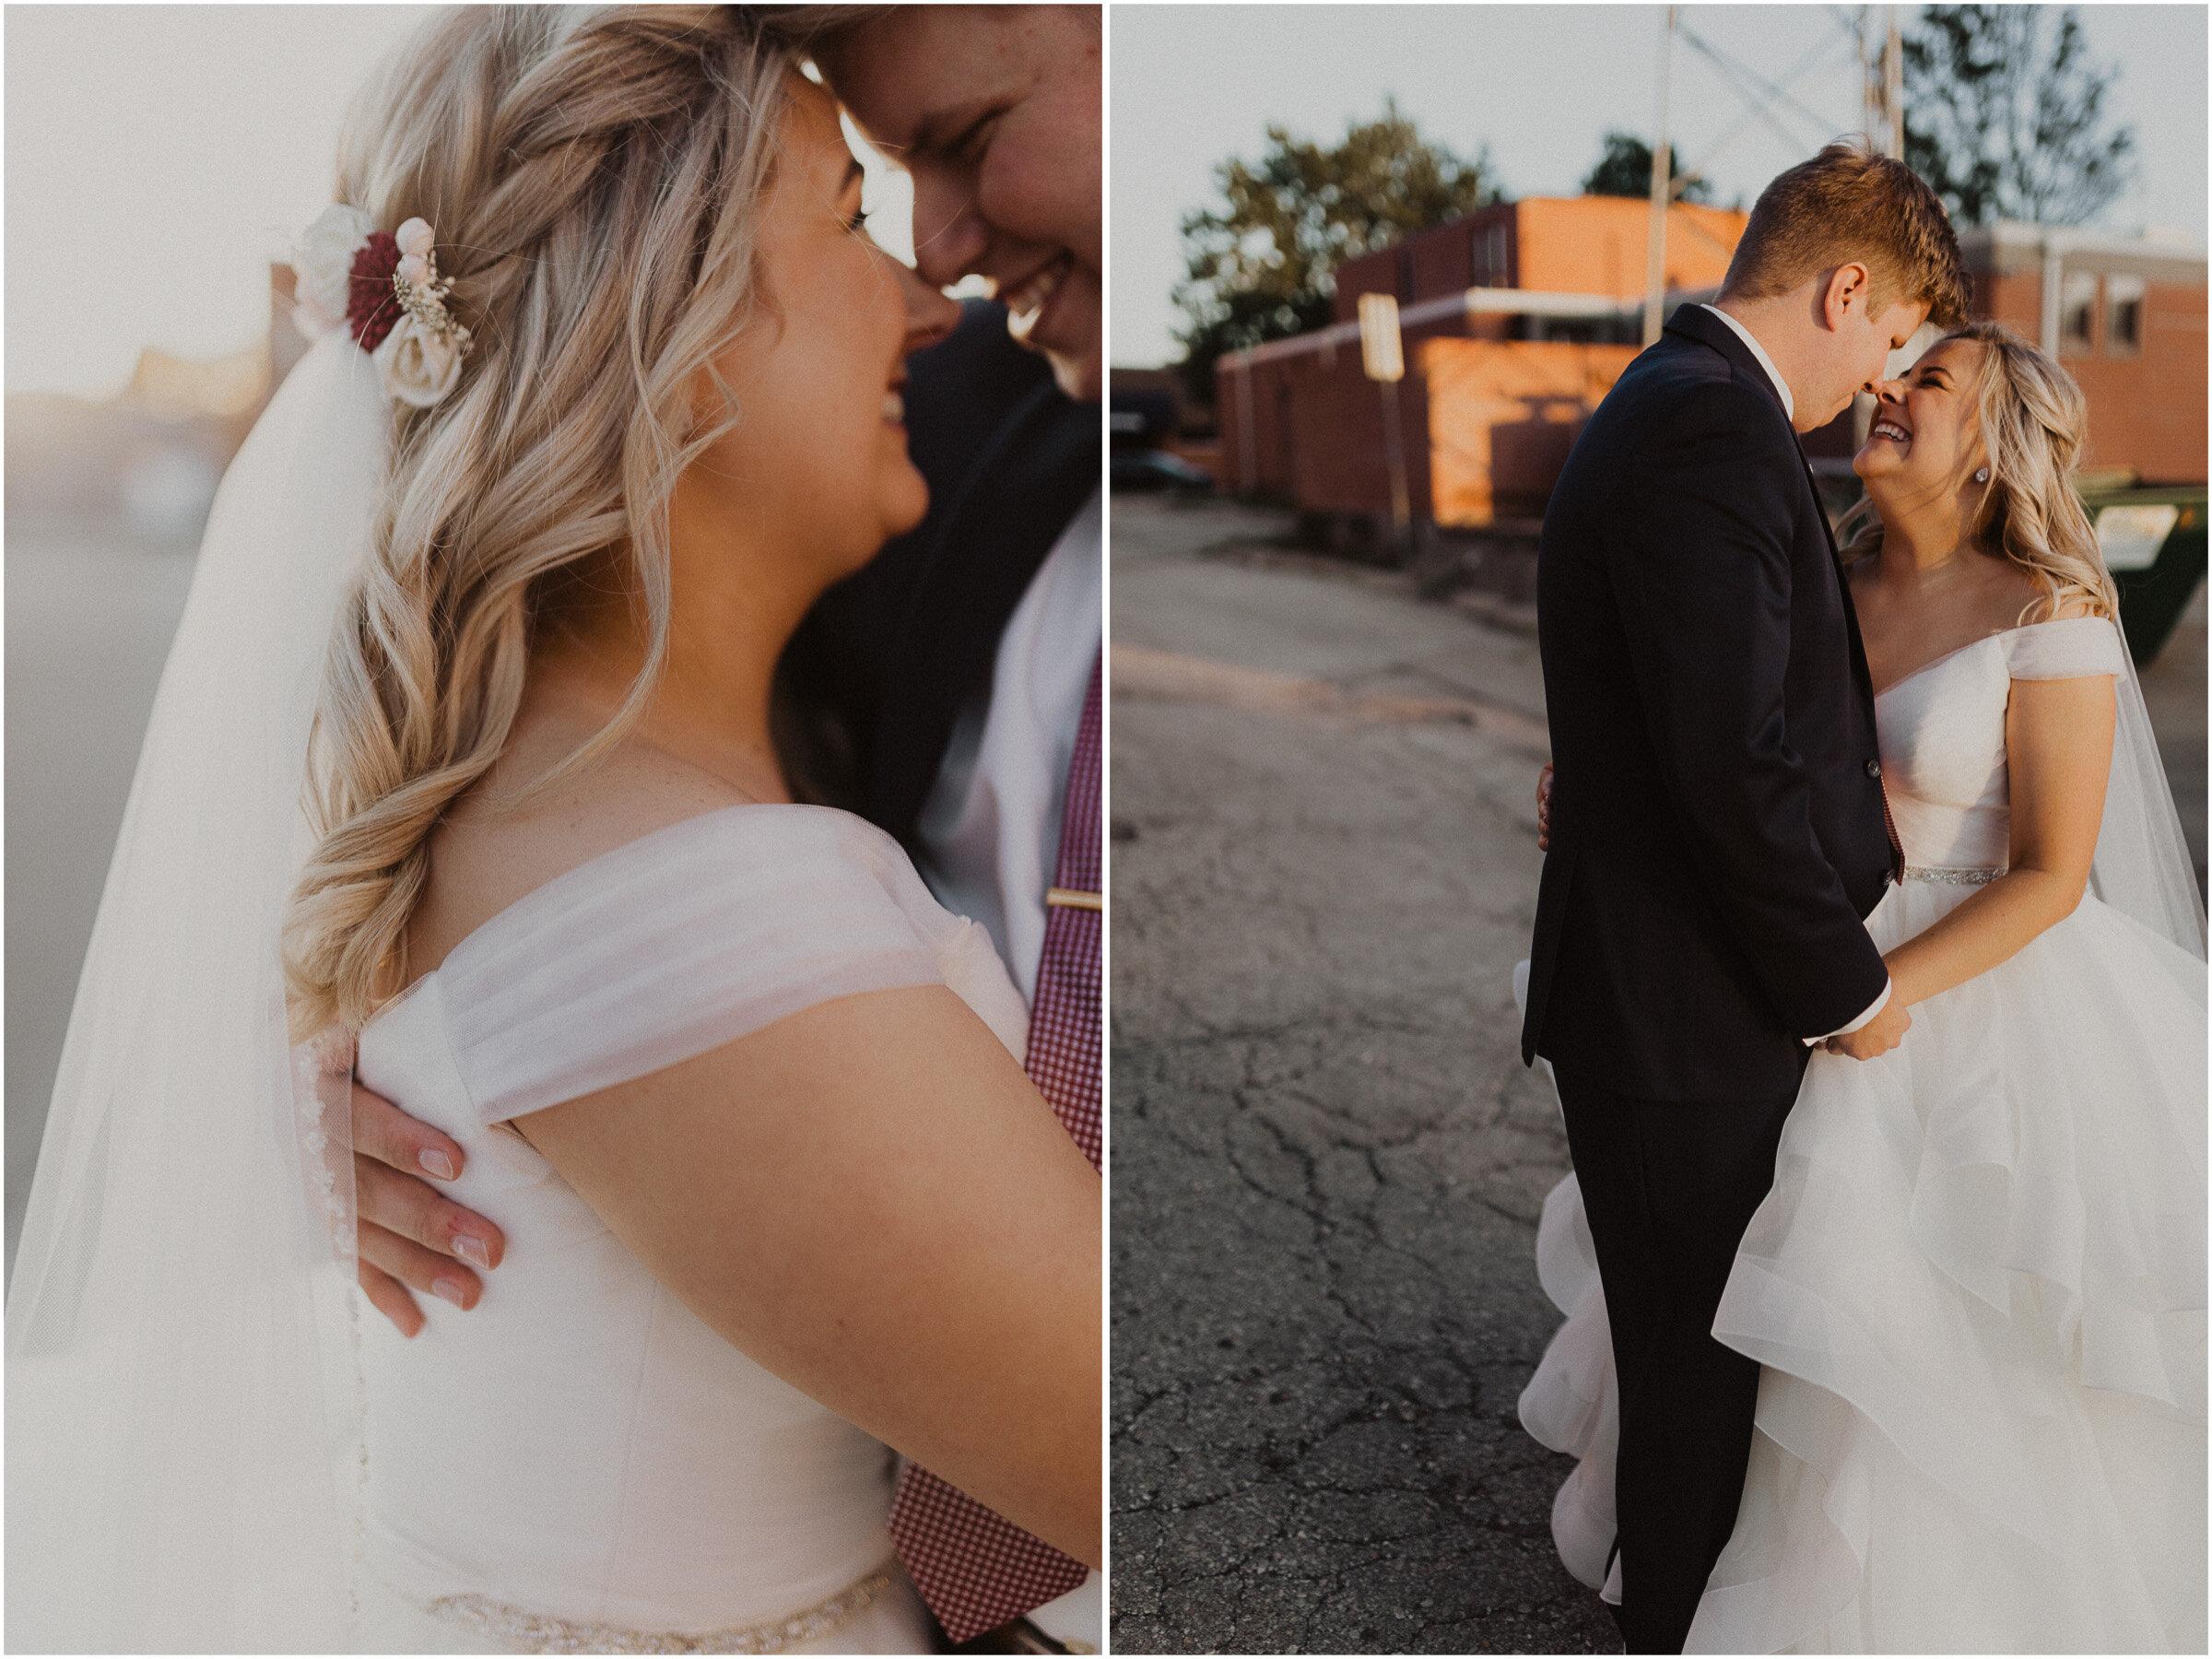 alyssa barletter photography town square paola wedding-41.jpg